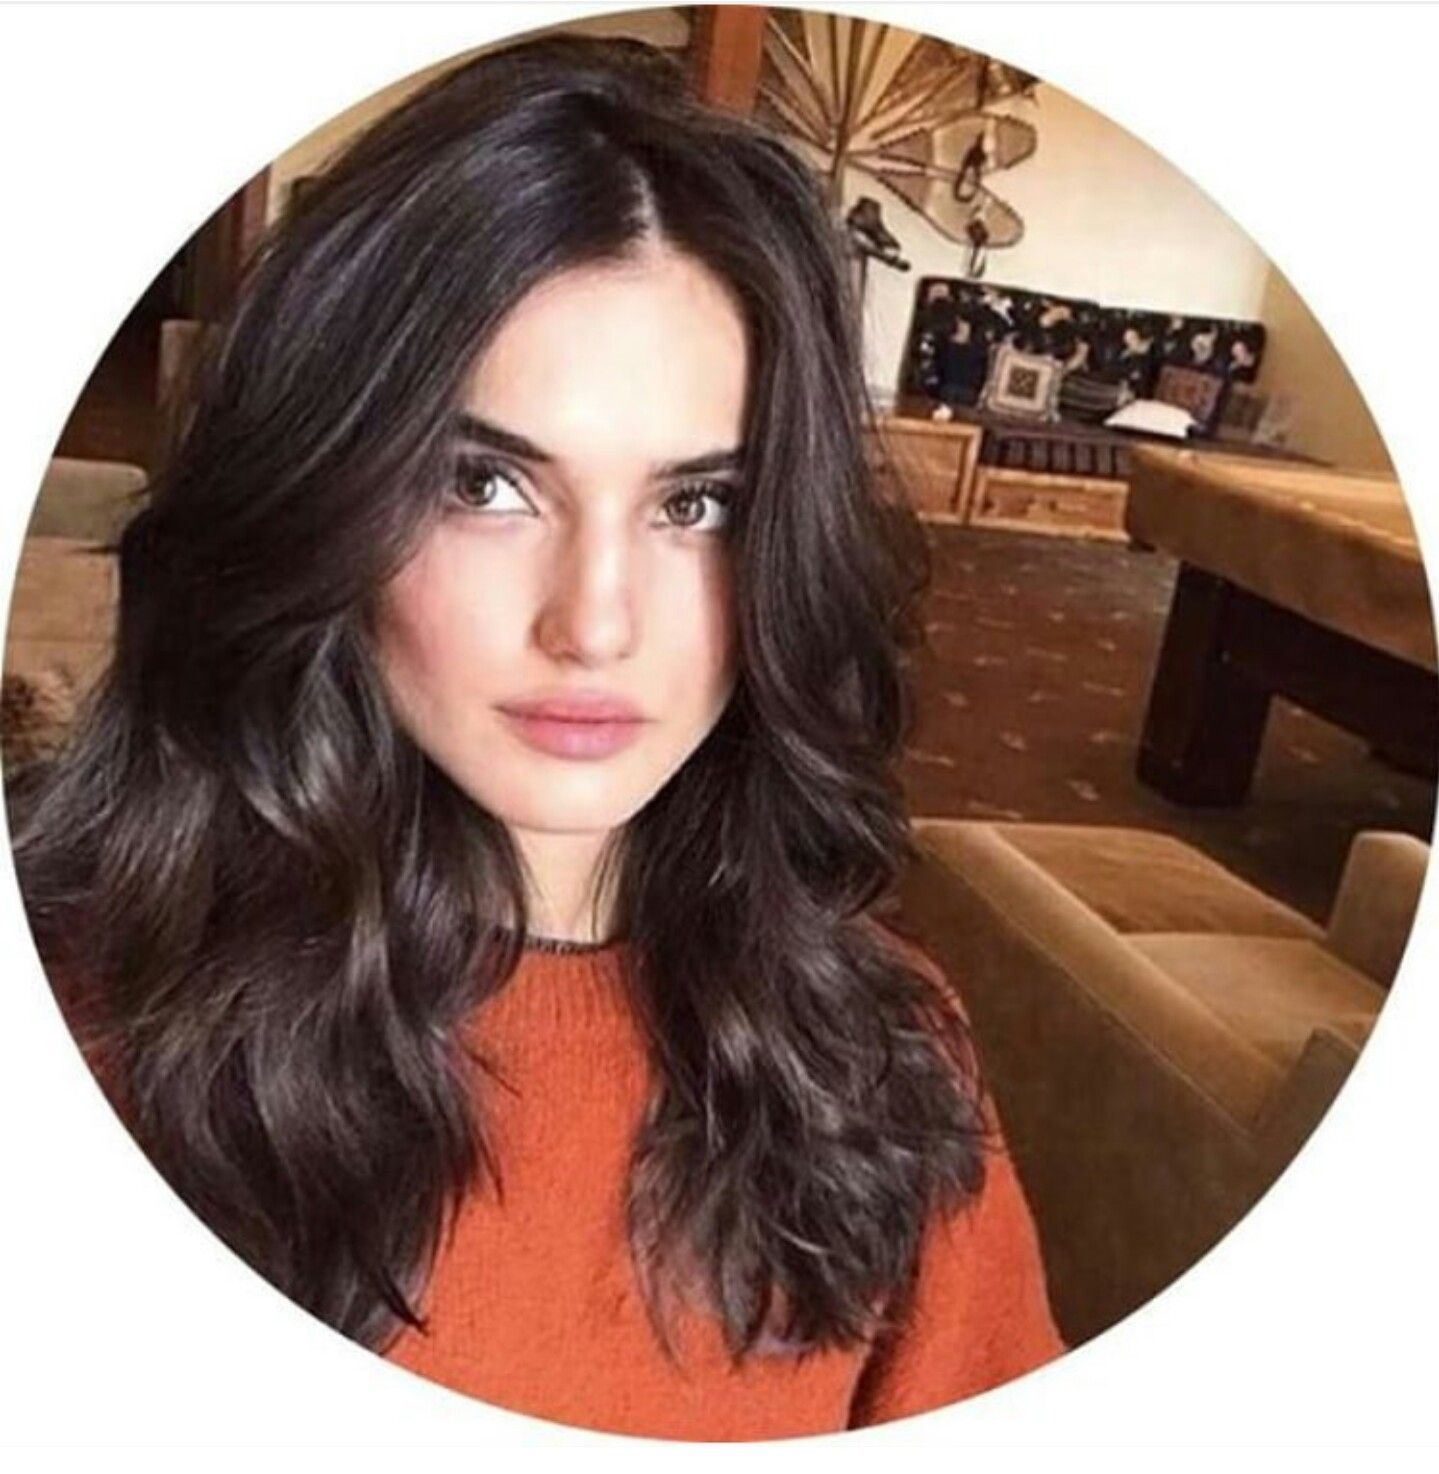 Pin by Ᏼ 𖤐 on افتارات Beauty, Girl, Profile photo